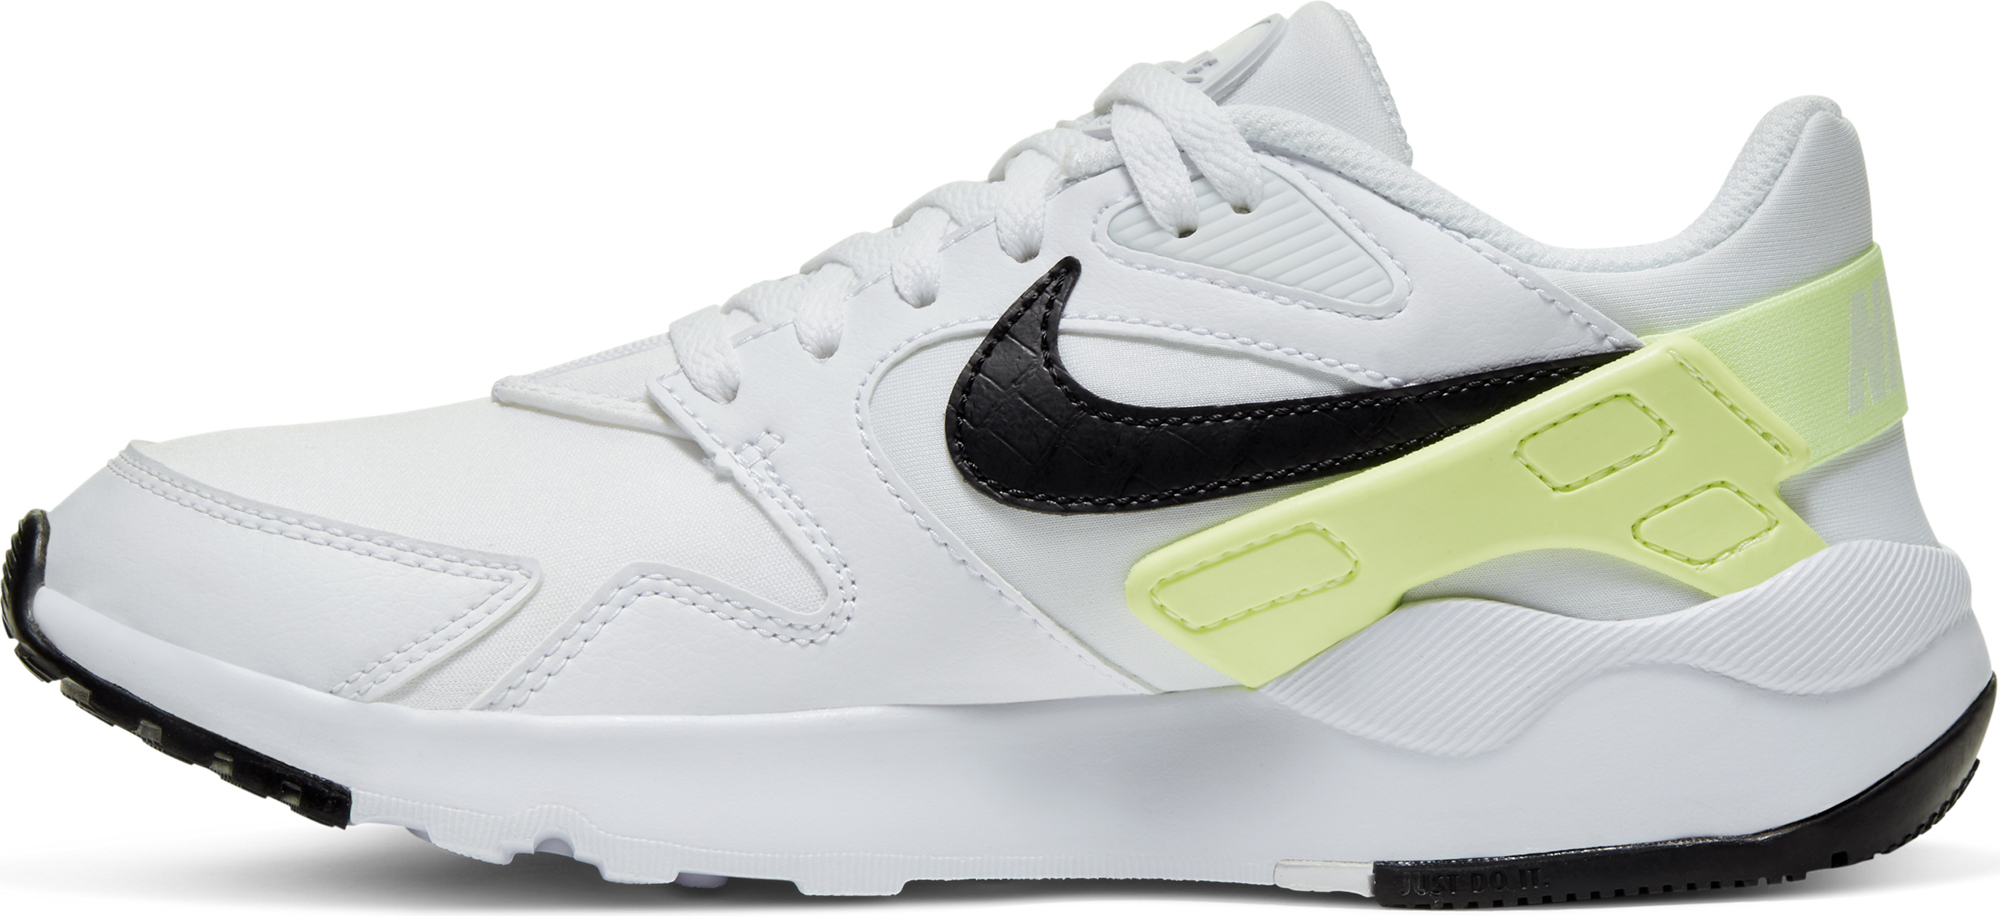 Nike Кроссовки женские Nike Ld Victory, размер 37,5 цена